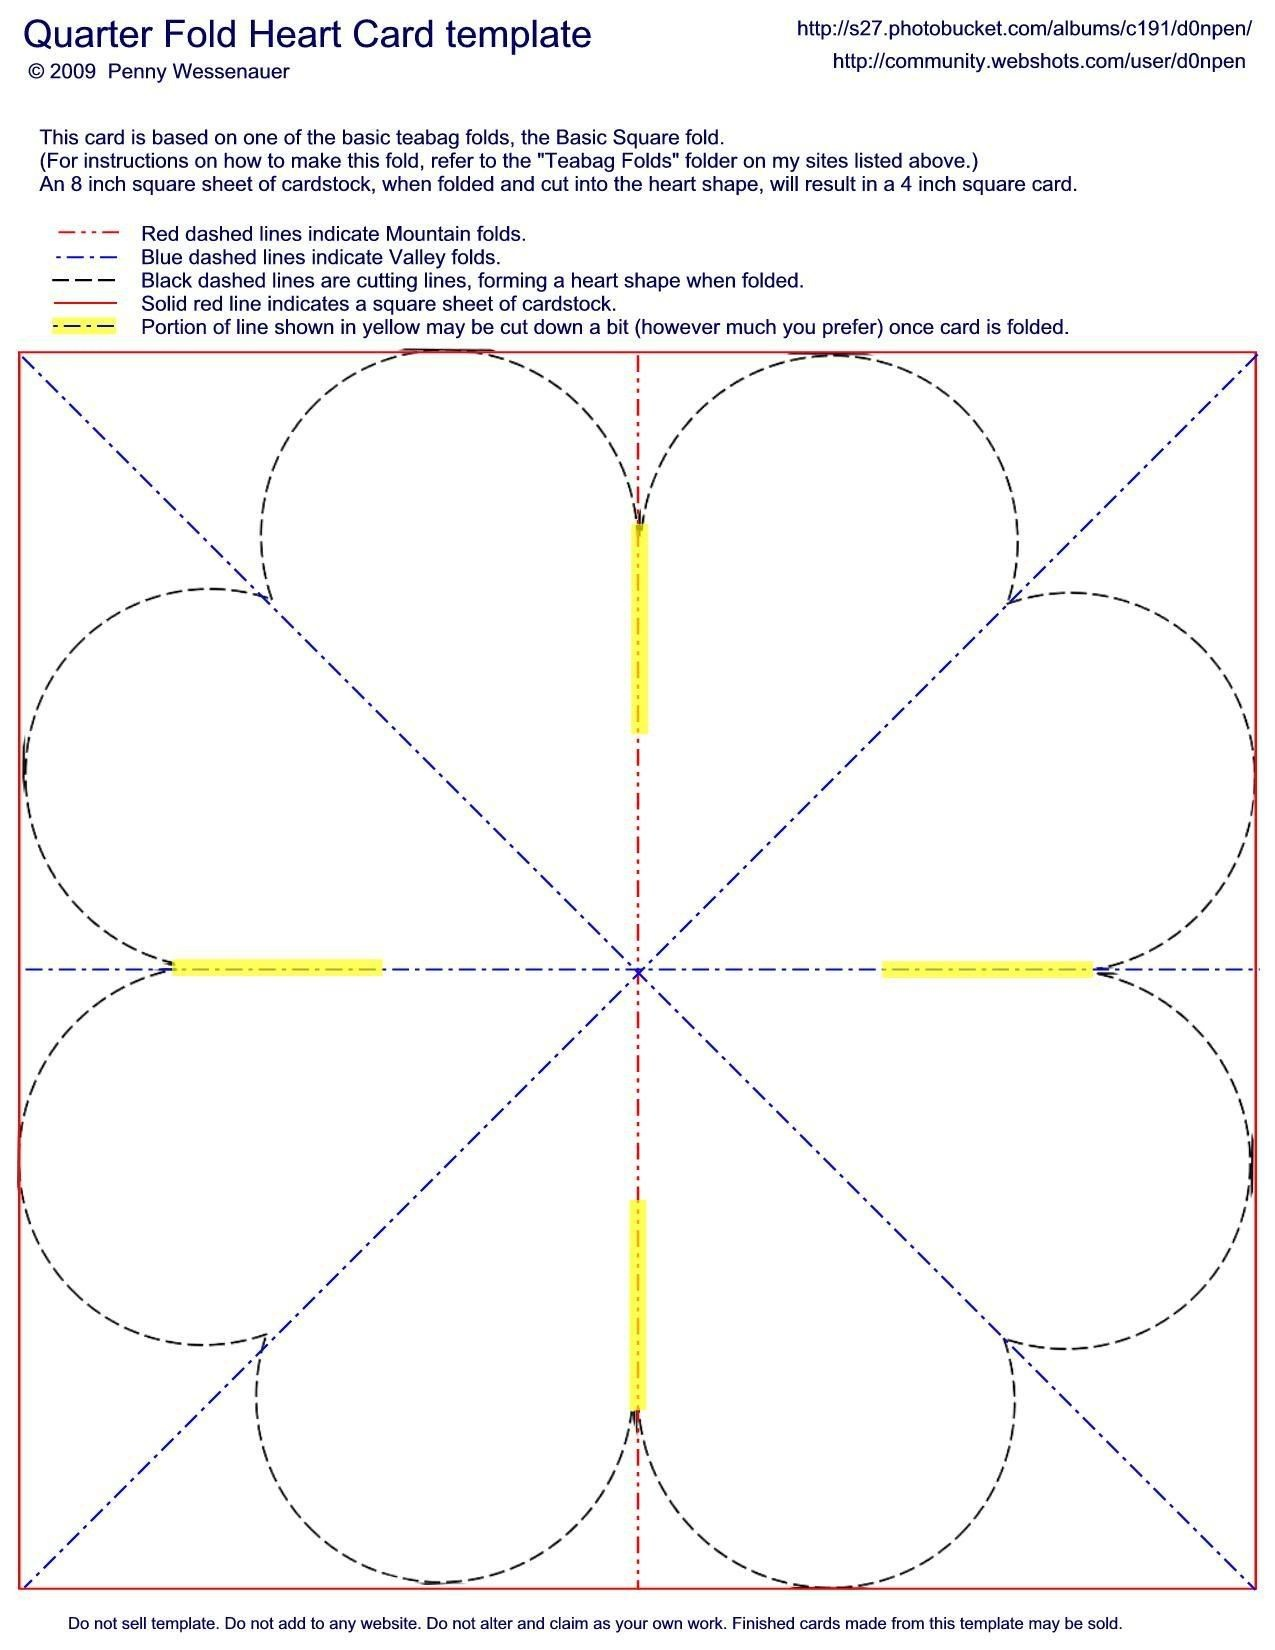 Quarter-Fold Heart Card Template   Valentines   Card Making - Free Printable Quarter Fold Christmas Cards